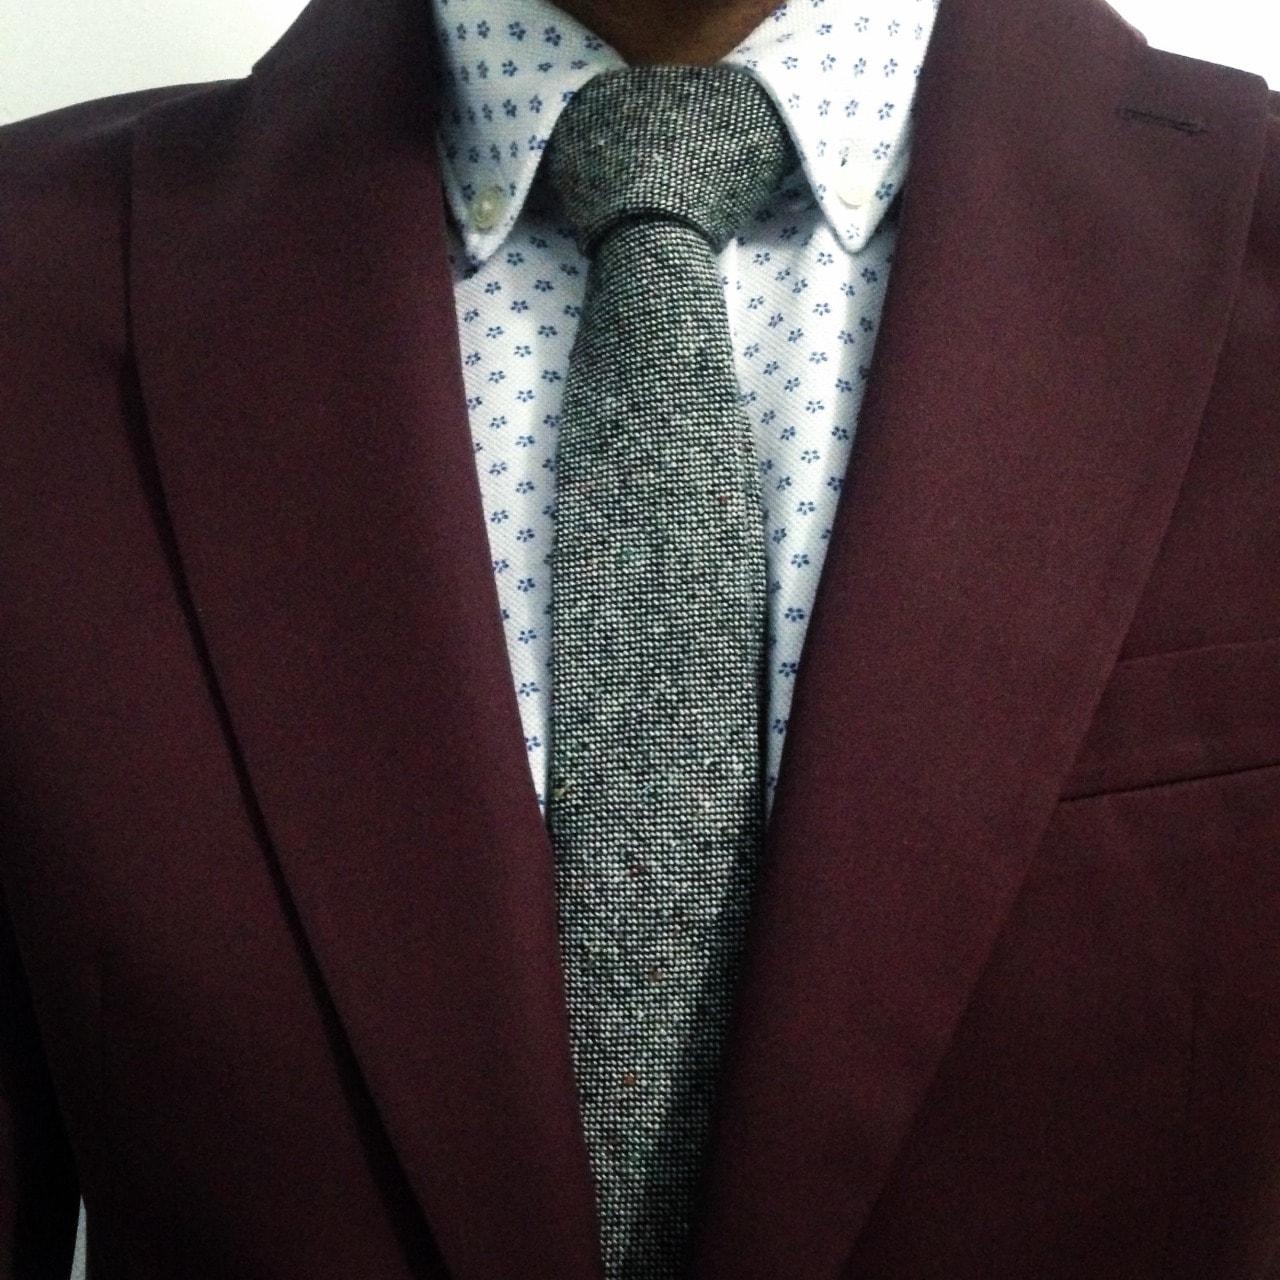 Цвет галстука к коричневой рубашке